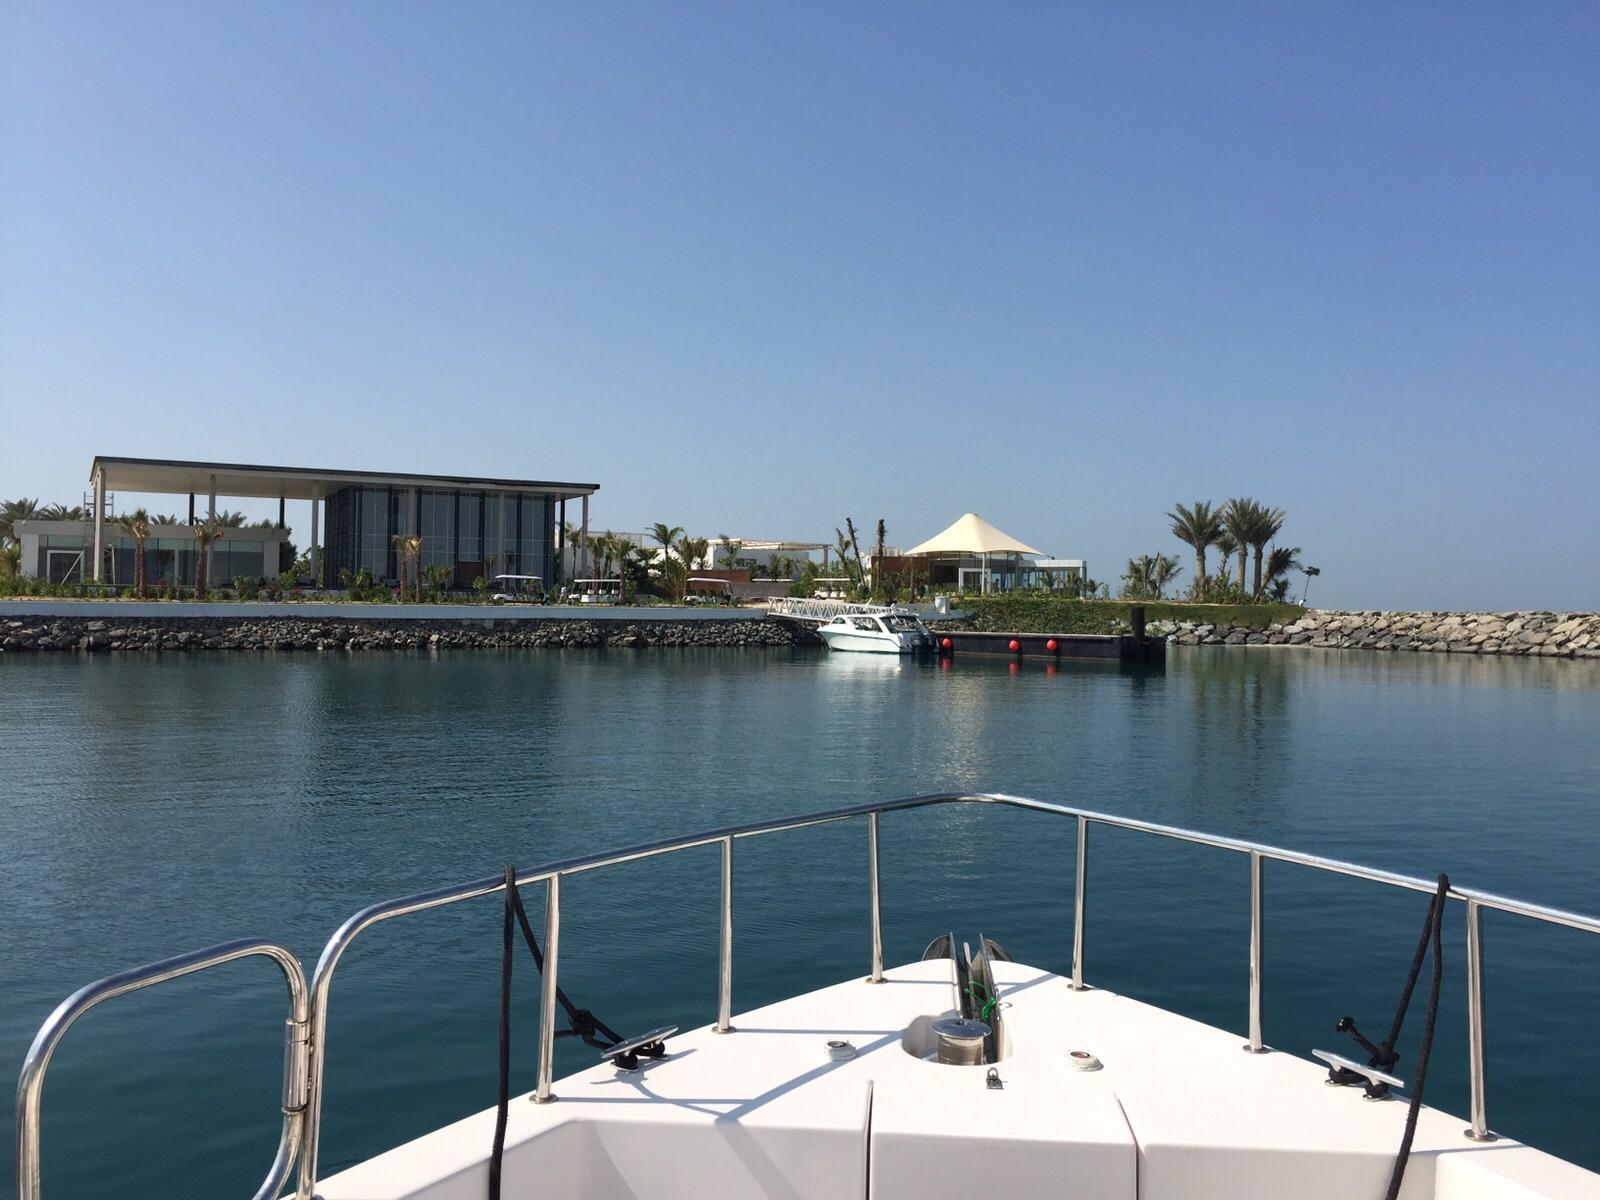 zaya nurai speed boat, Dubai, Middle East, Pierchic, zaya nurai, zaya nurai resort